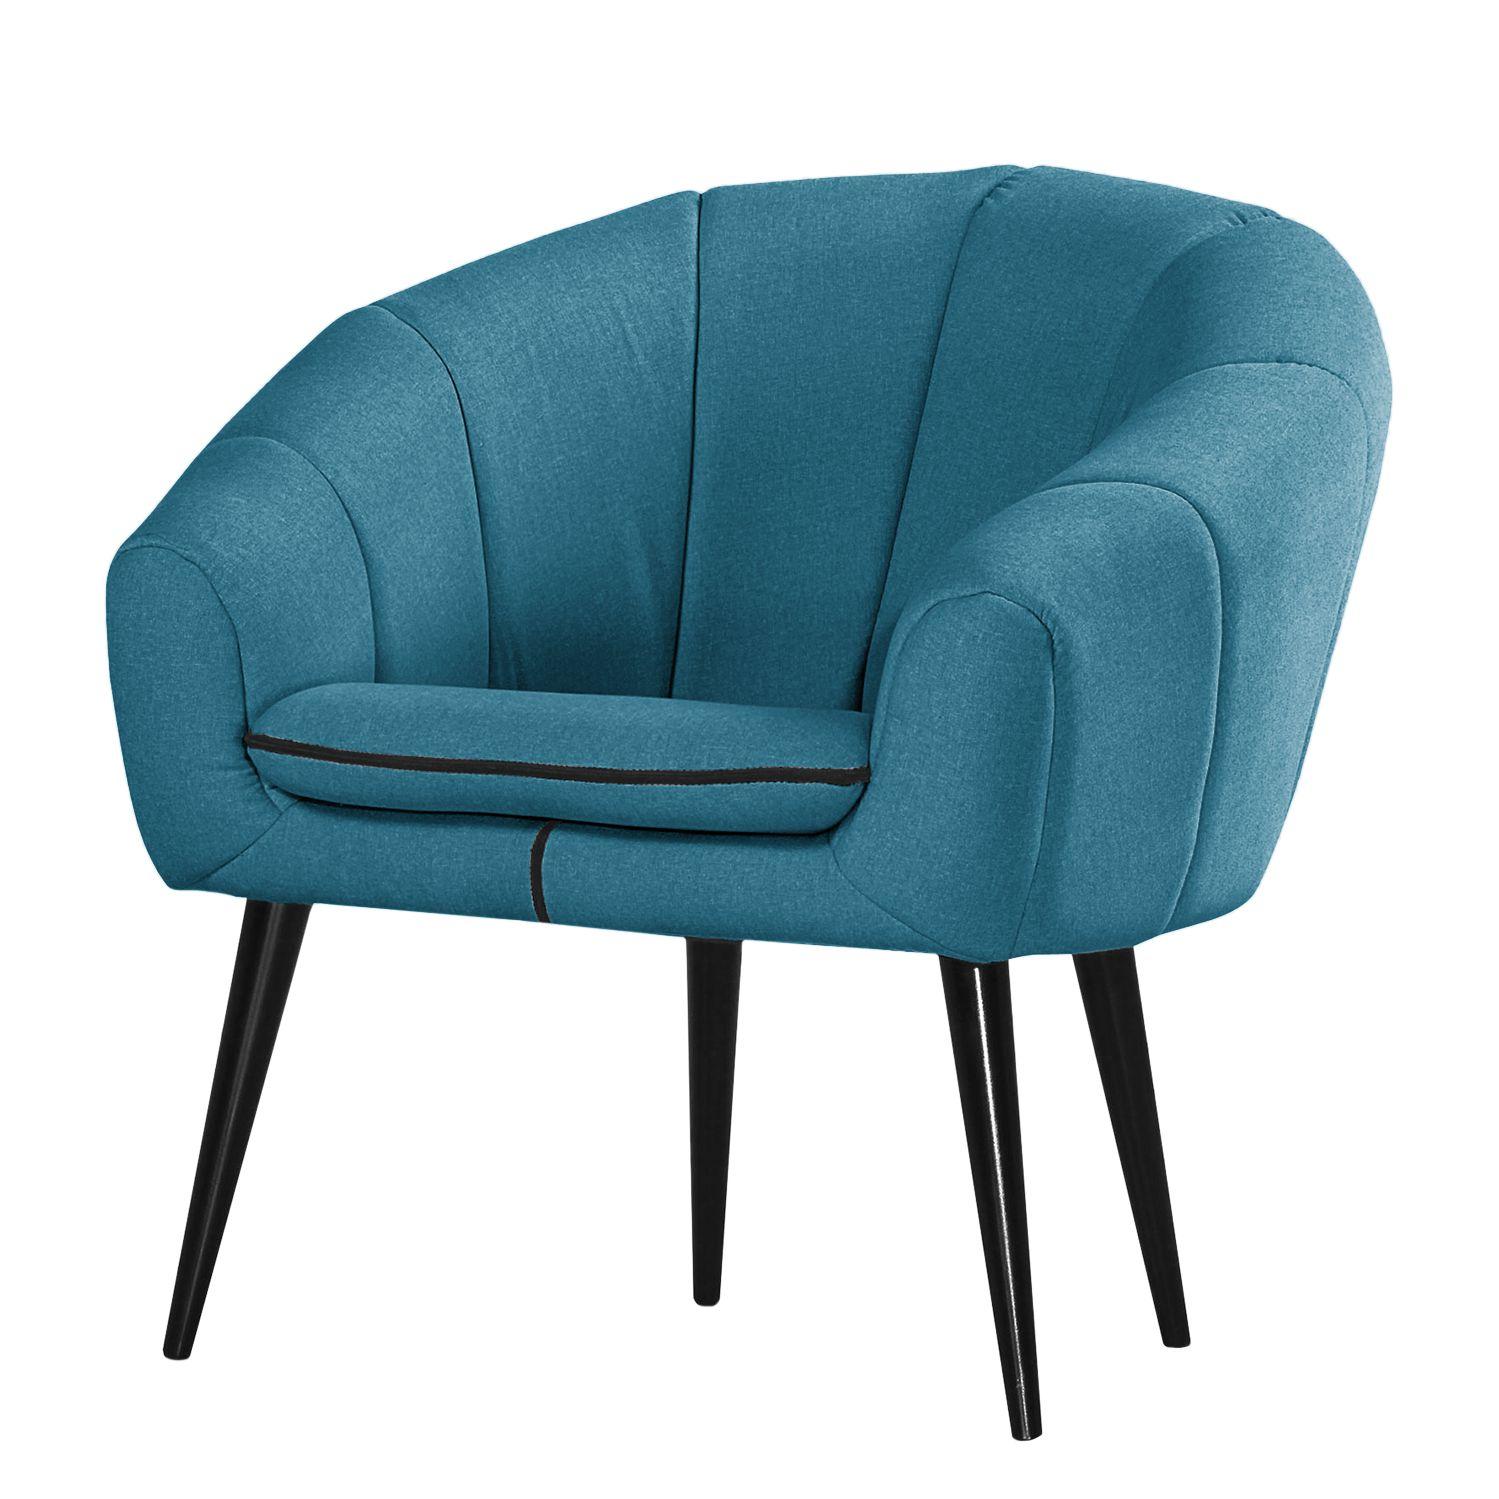 Sessel buttlar webstoff petrol norrwood online kaufen for Sessel petrol